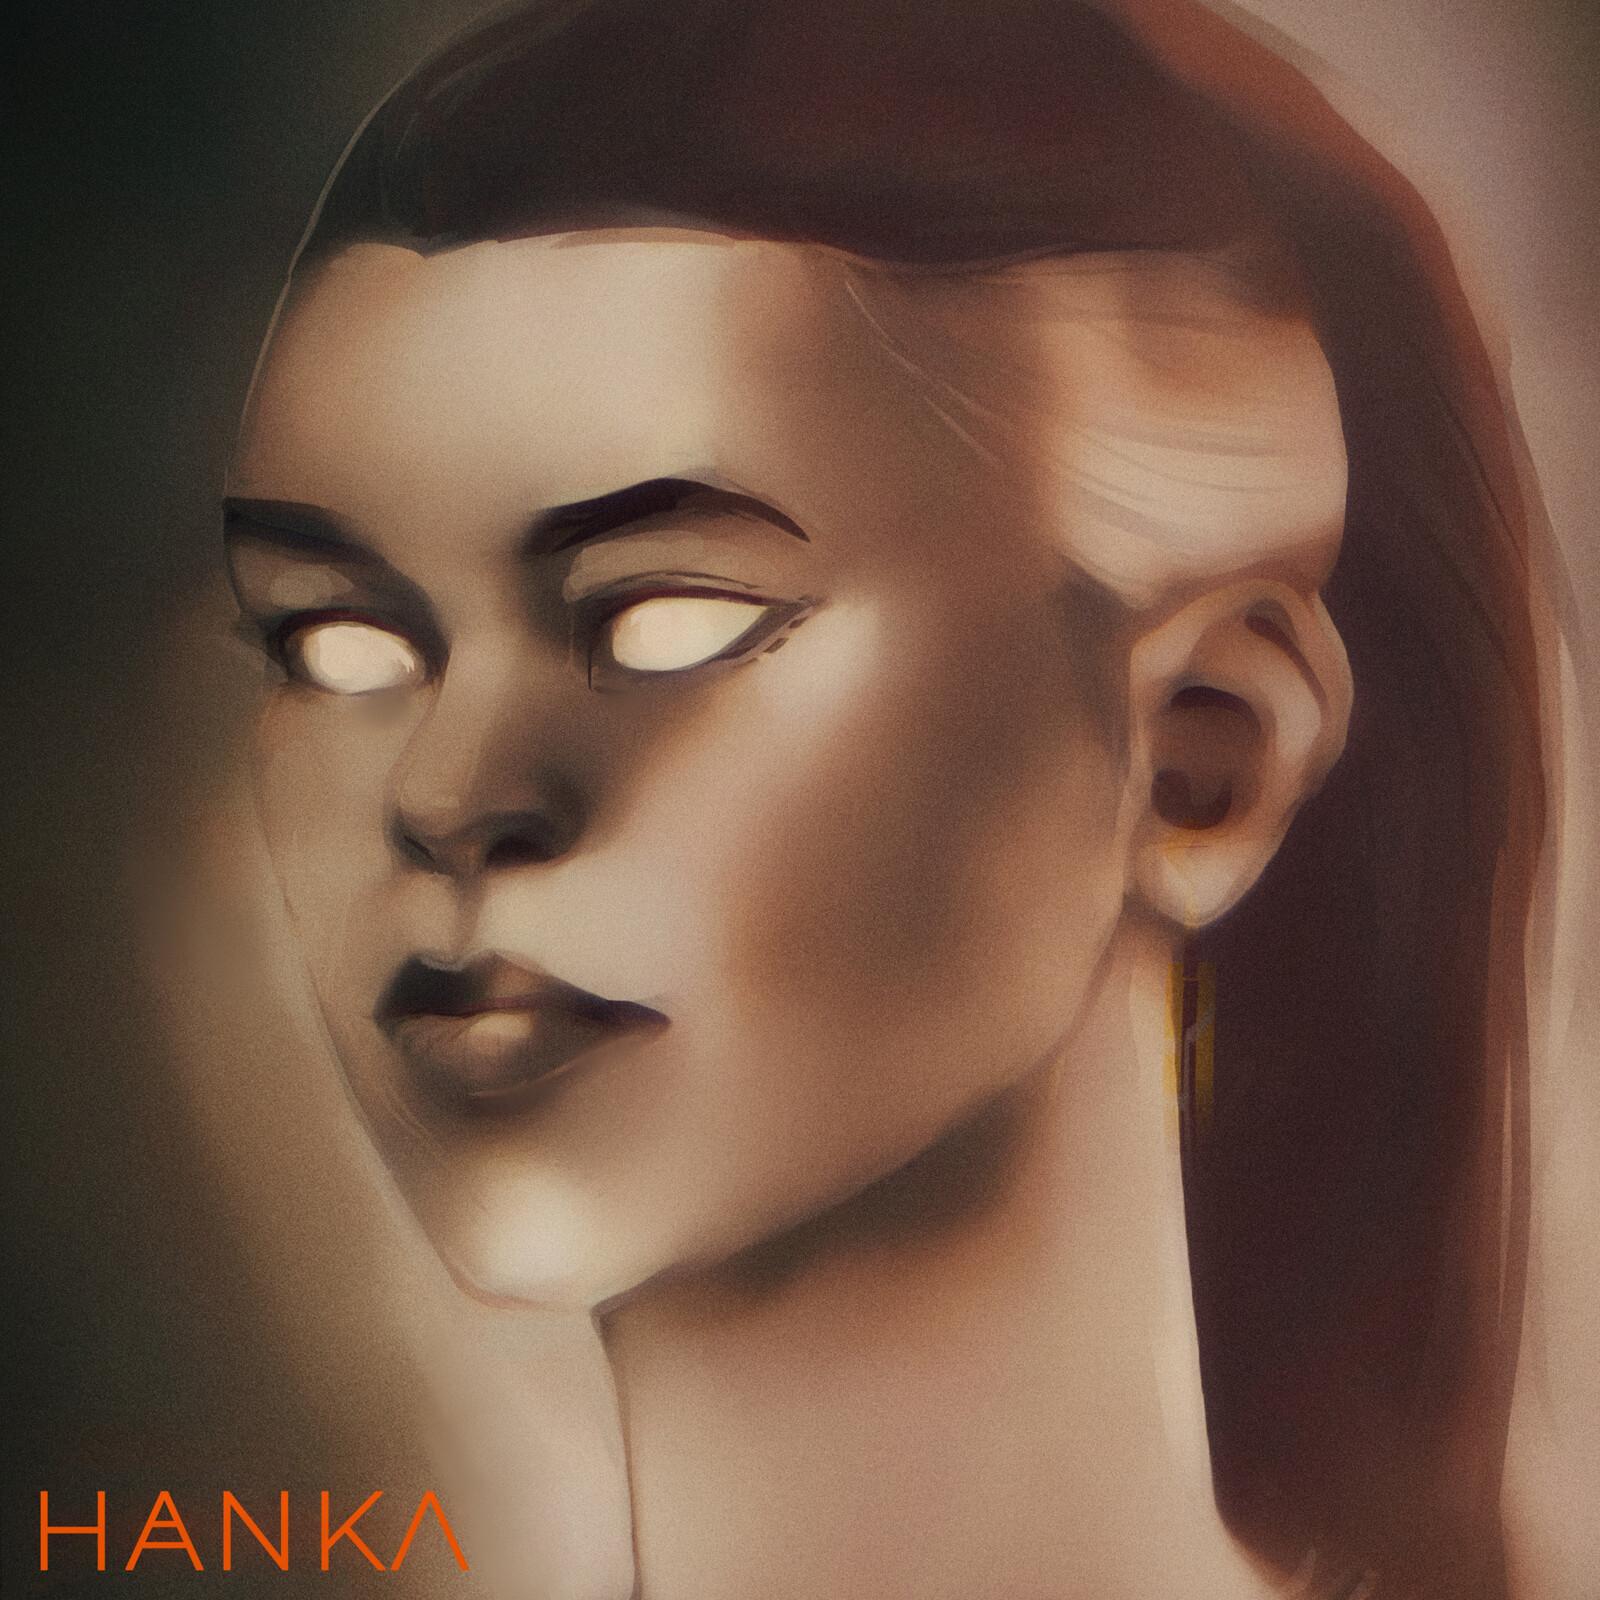 HANKΛ